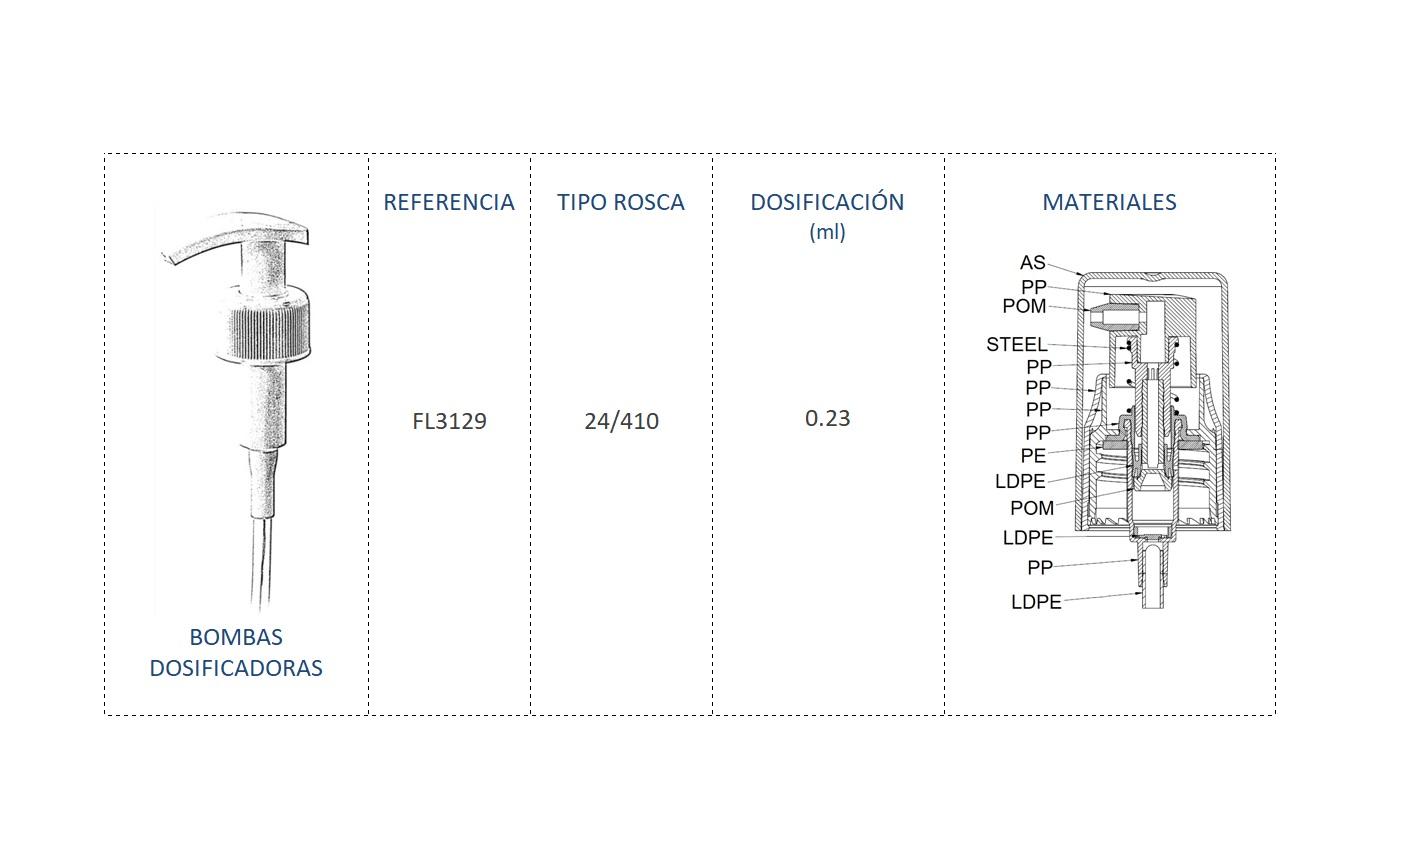 Cuadro de materiales bomba dosificadora FL3129 24-410